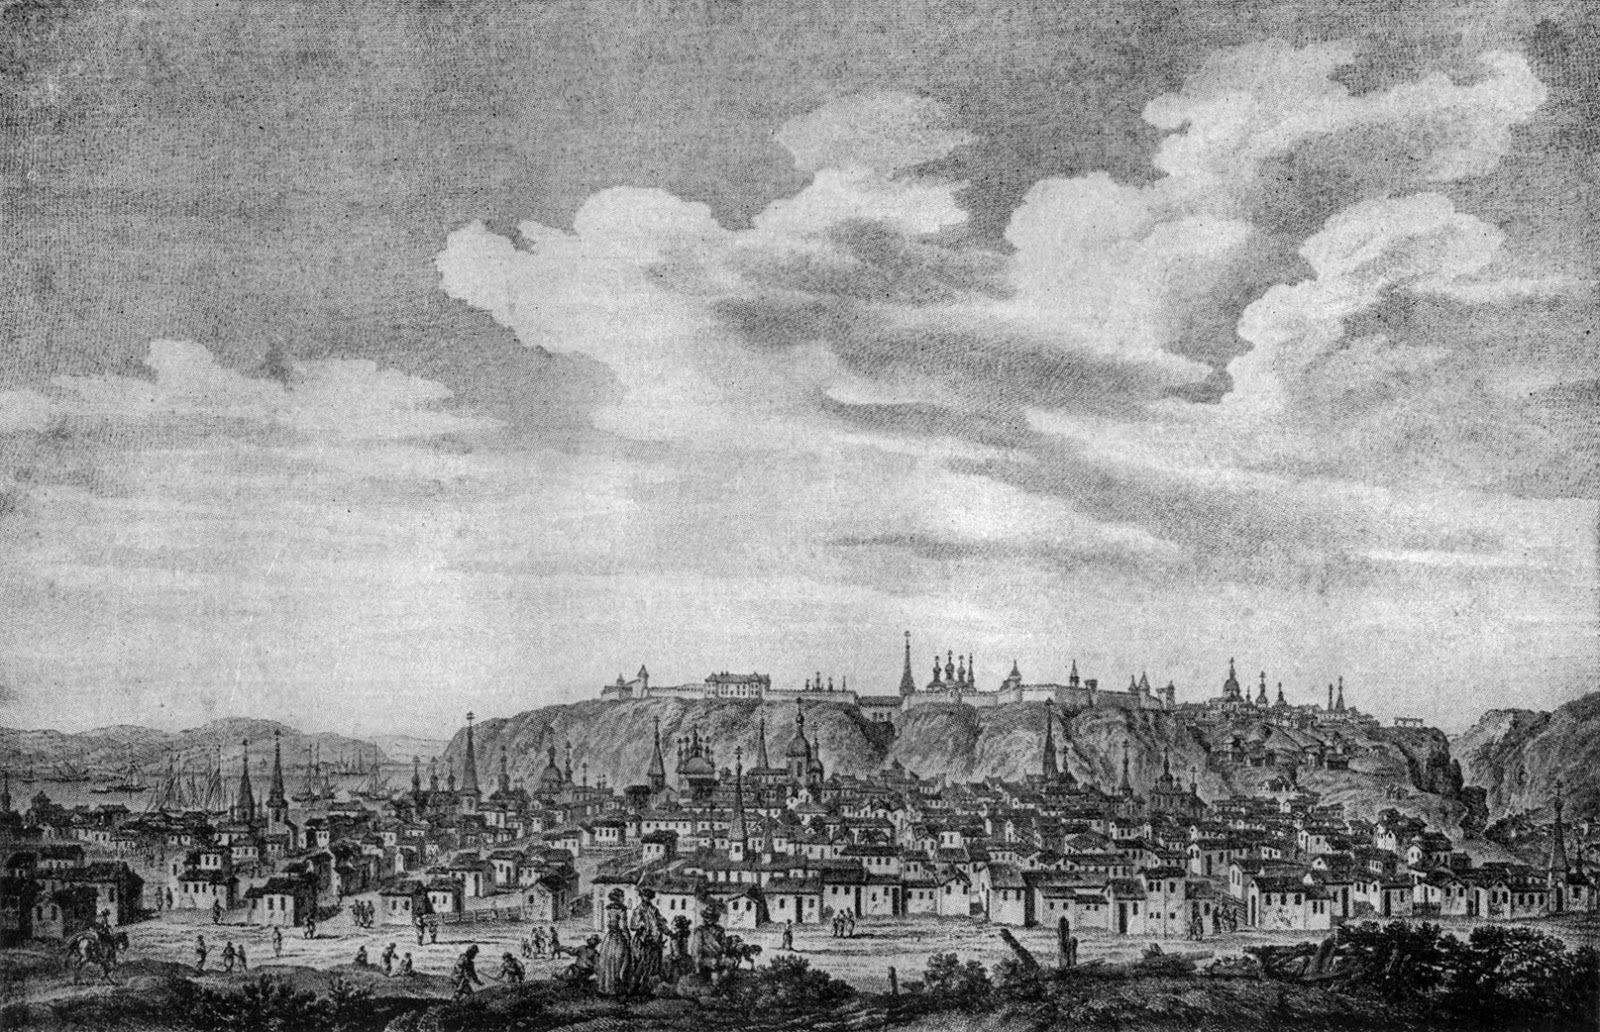 Панорама Тобольска. Альфред Рамбо, 1880 год